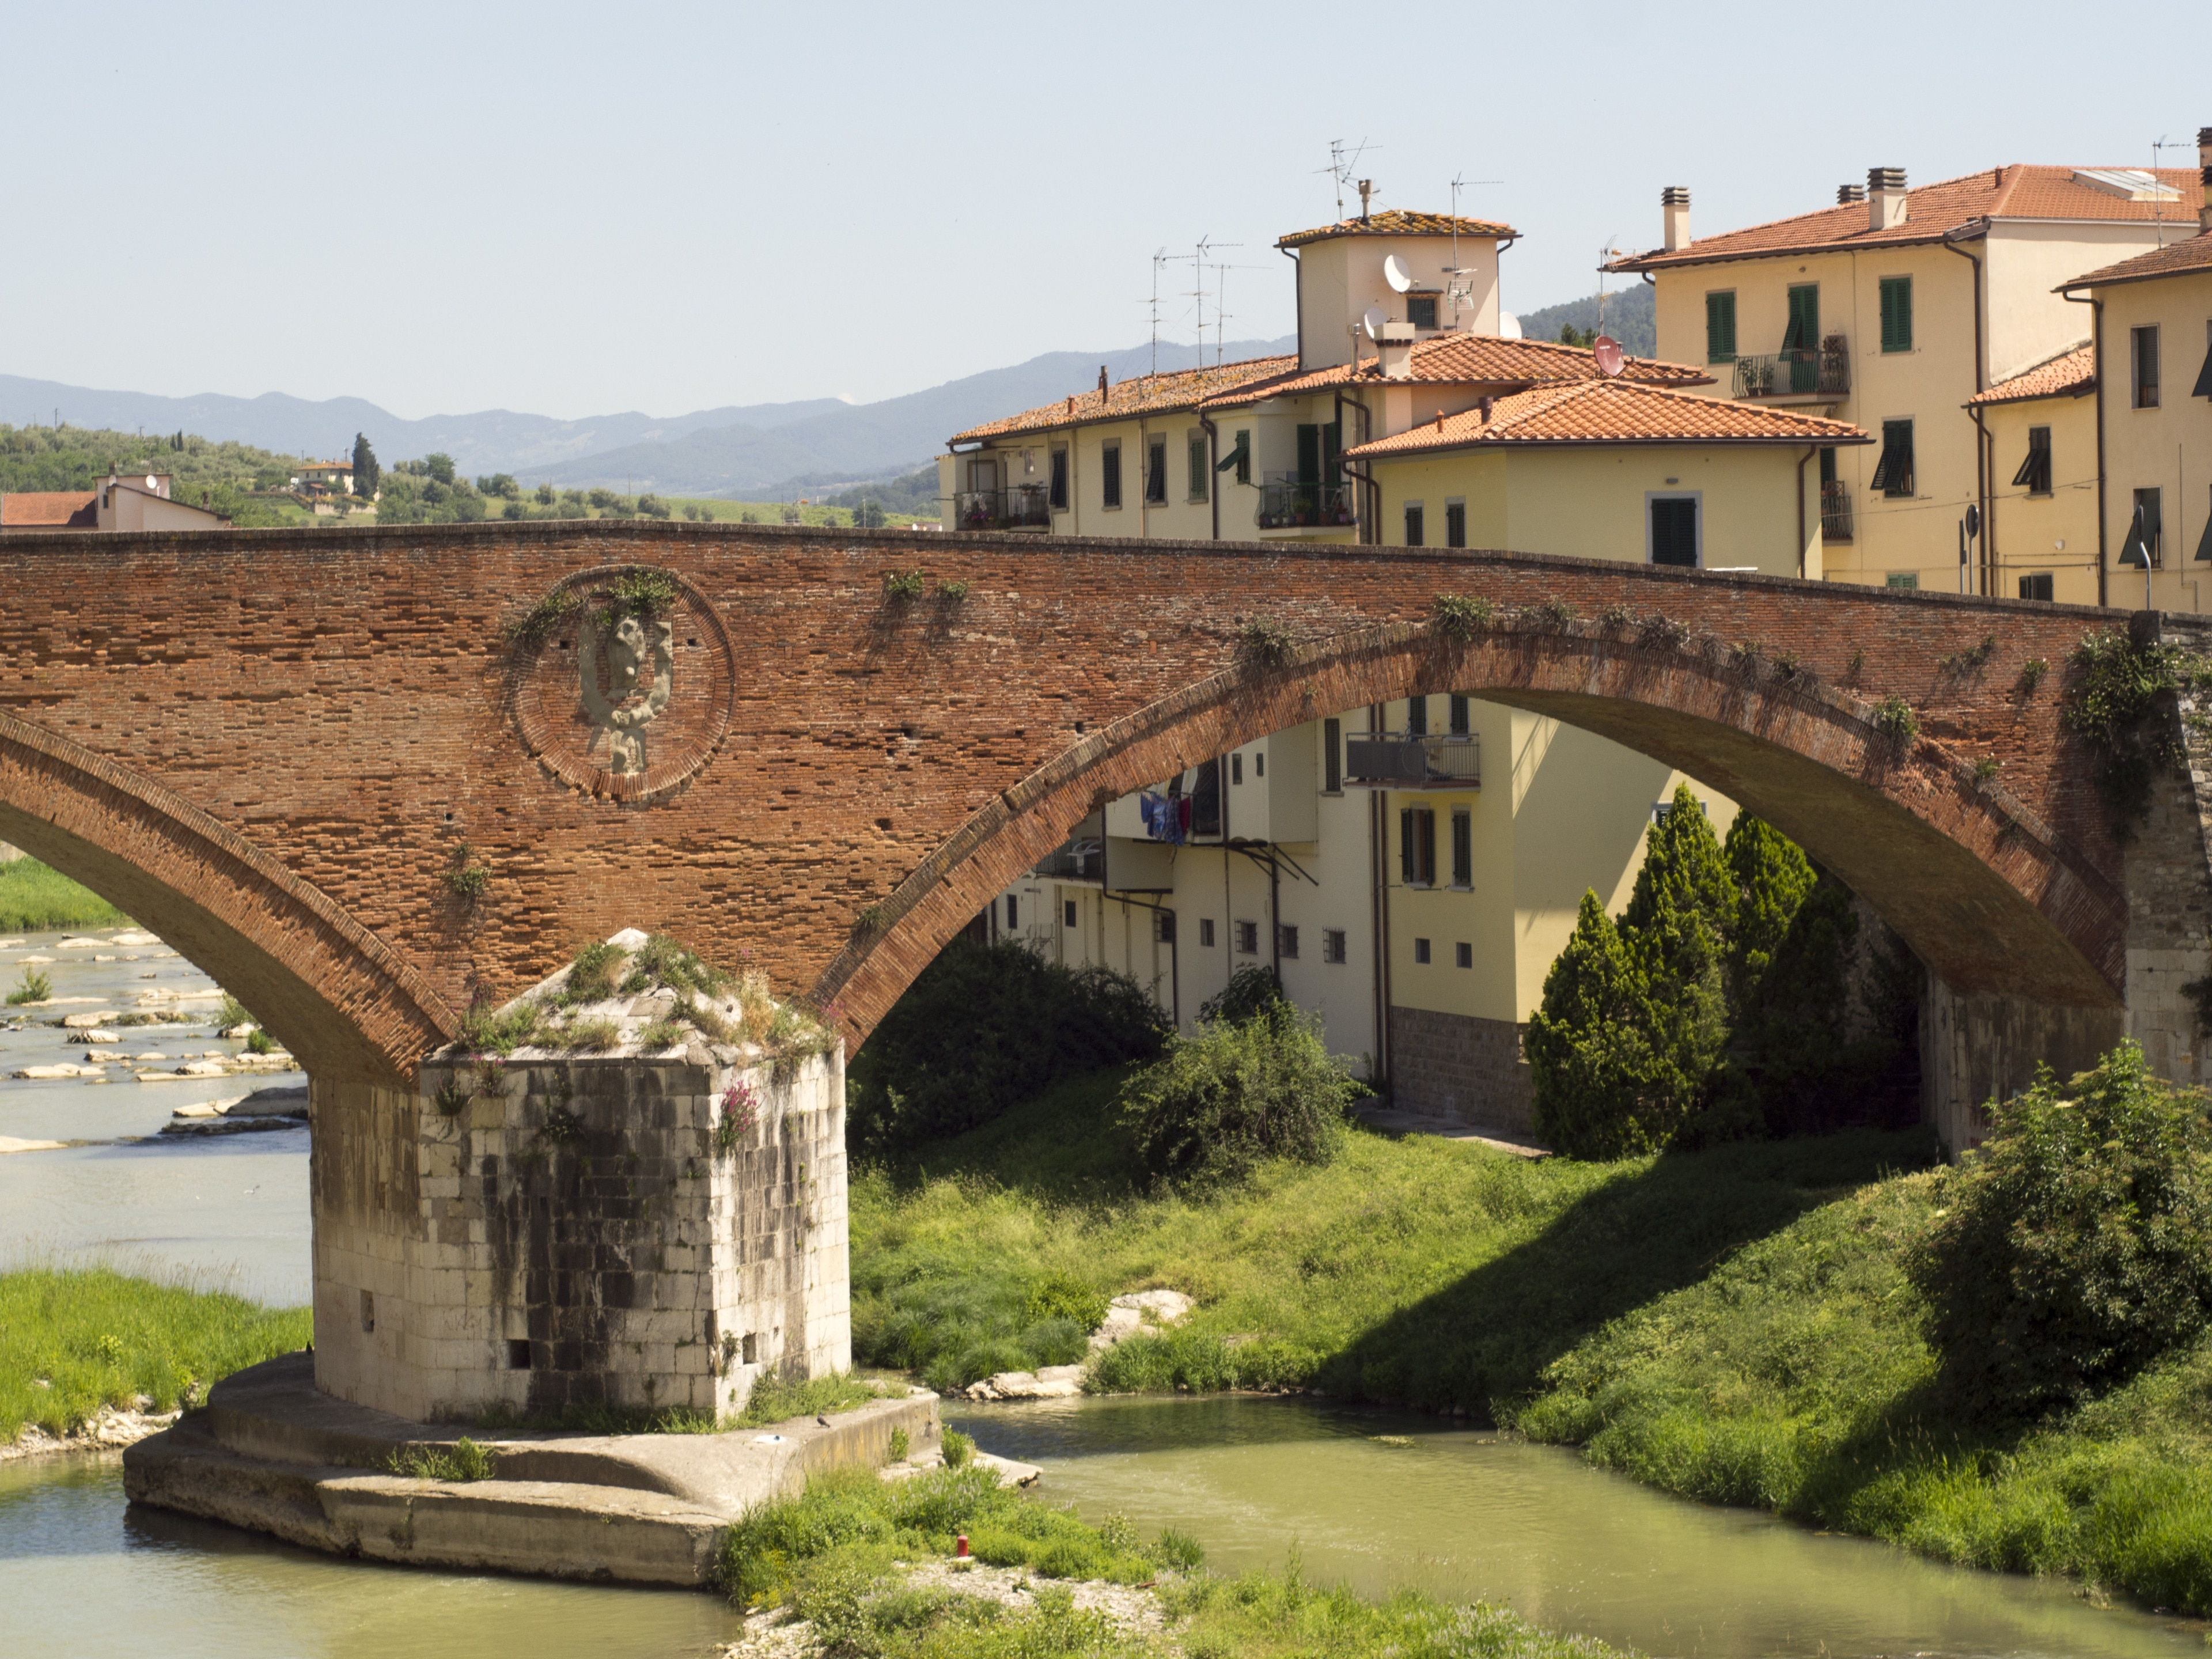 Montagna Fiorentina, Toskana, Italien